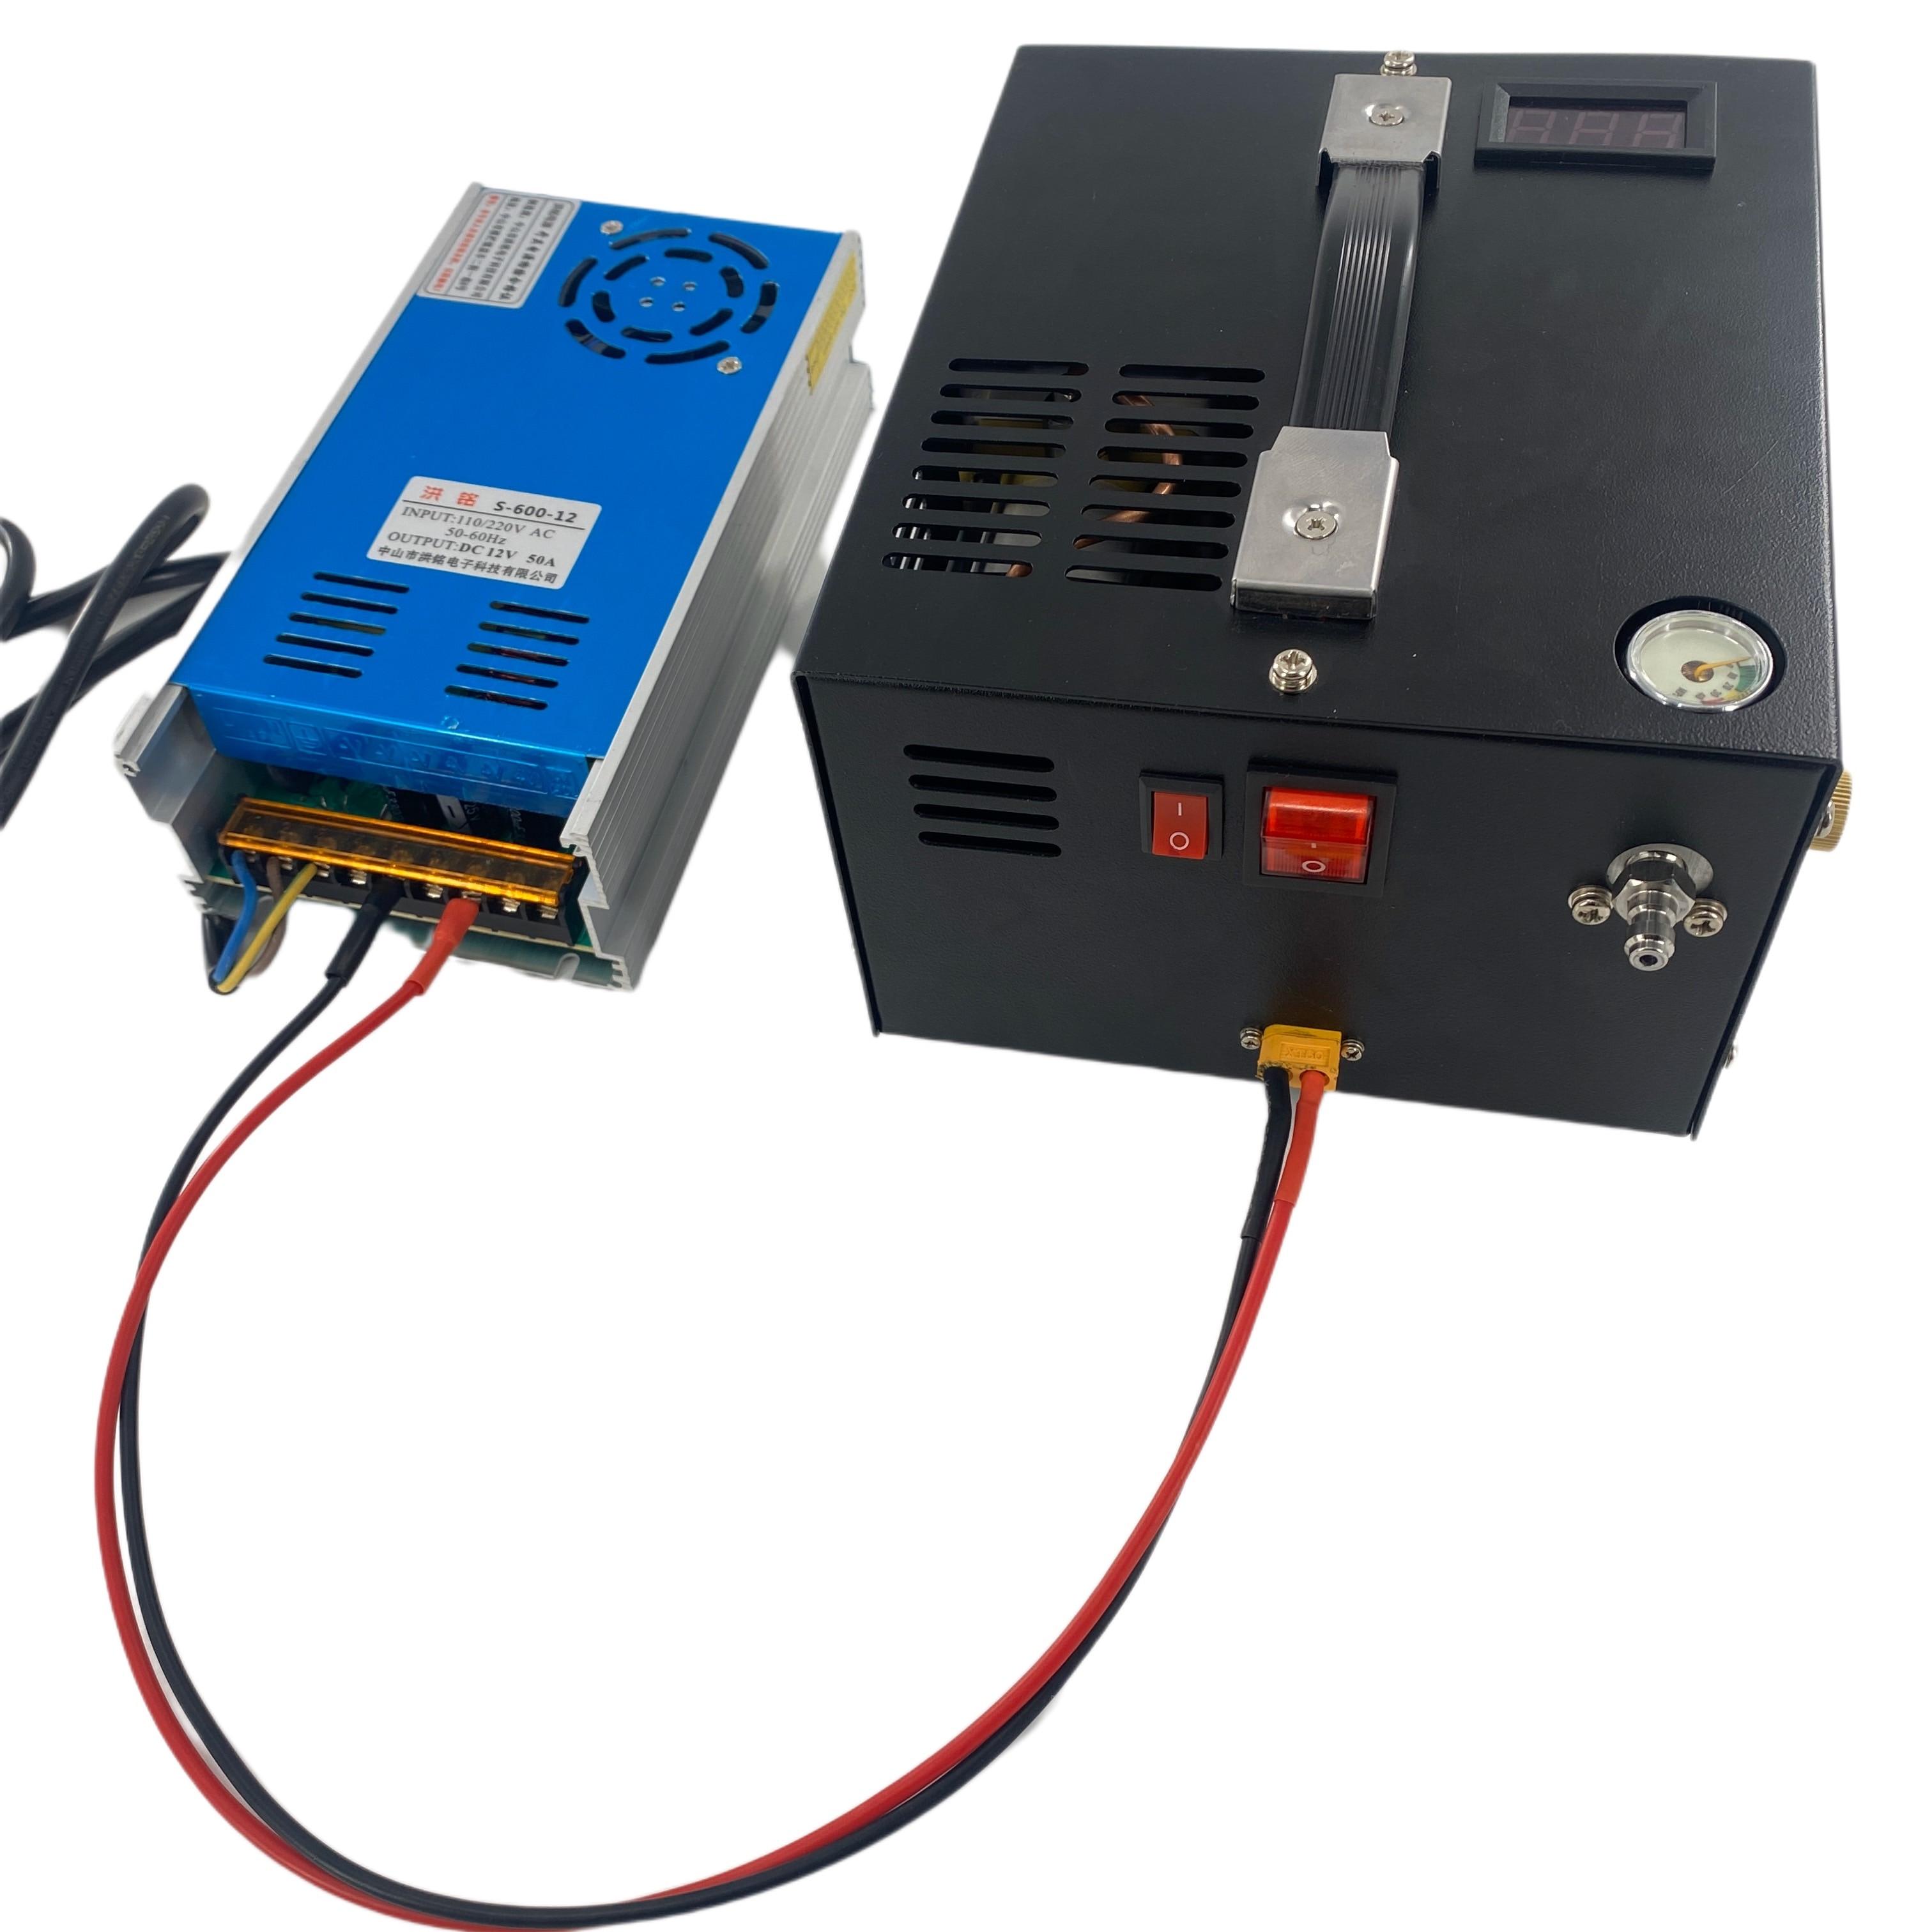 300bar 30mpa 12v pcp compressorWith 110/220V Transformer 12v pcp compressor4500psi compressor